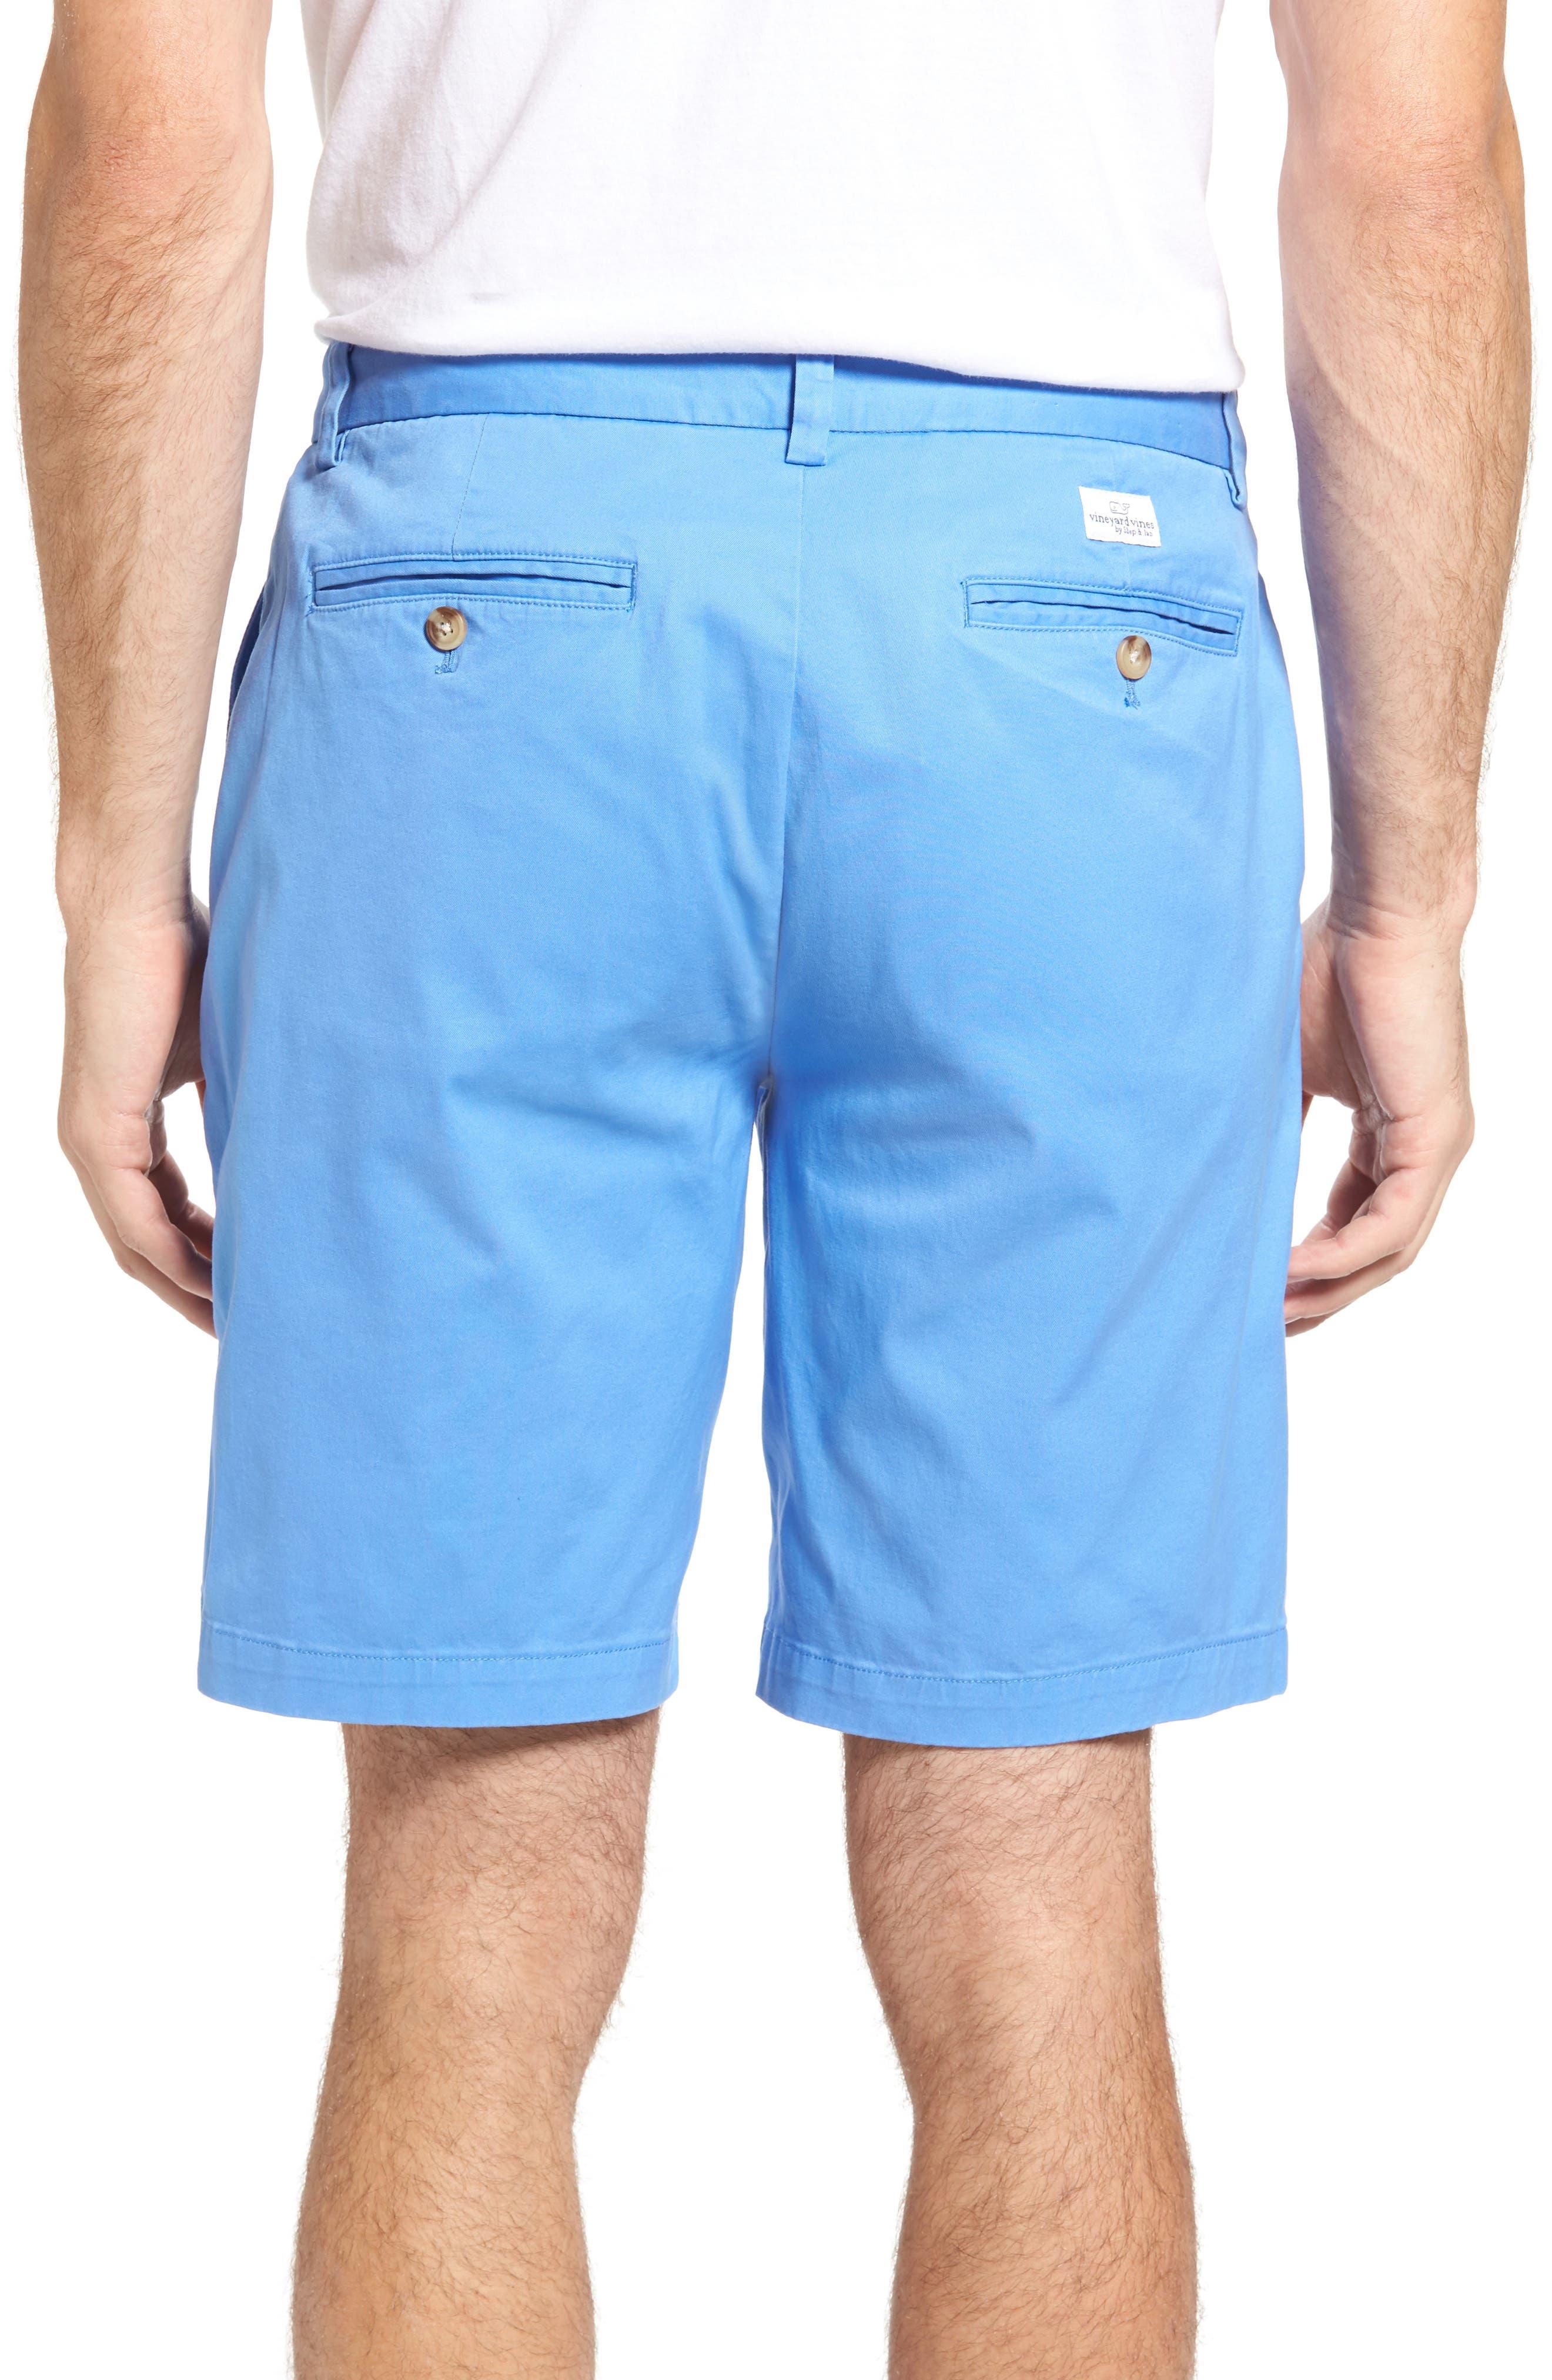 9 Inch Stretch Breaker Shorts,                             Alternate thumbnail 39, color,